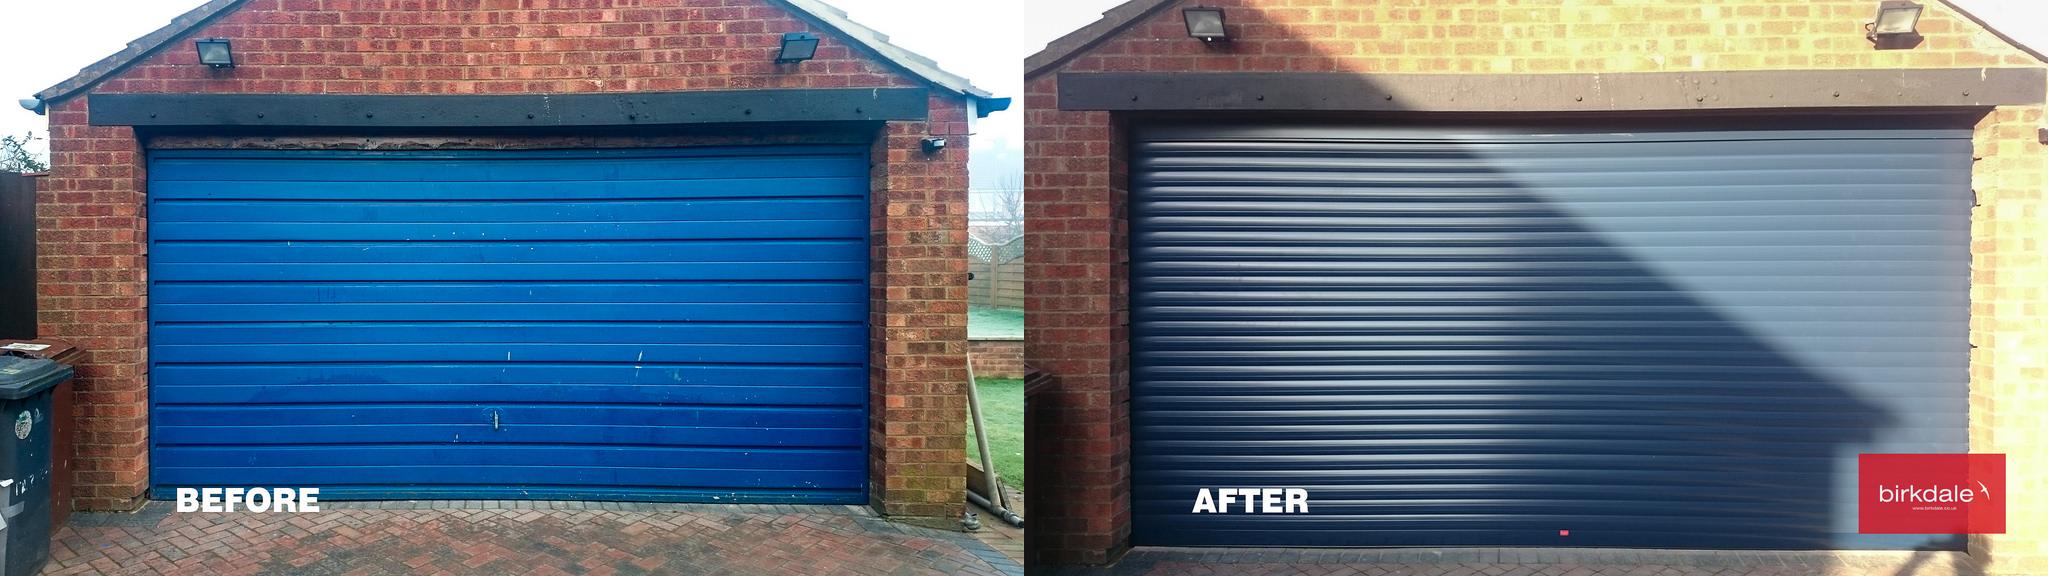 Insulated roller garage doors discount insulated roller doors birkdale insulated roller garage doors anthracite paint finish rubansaba